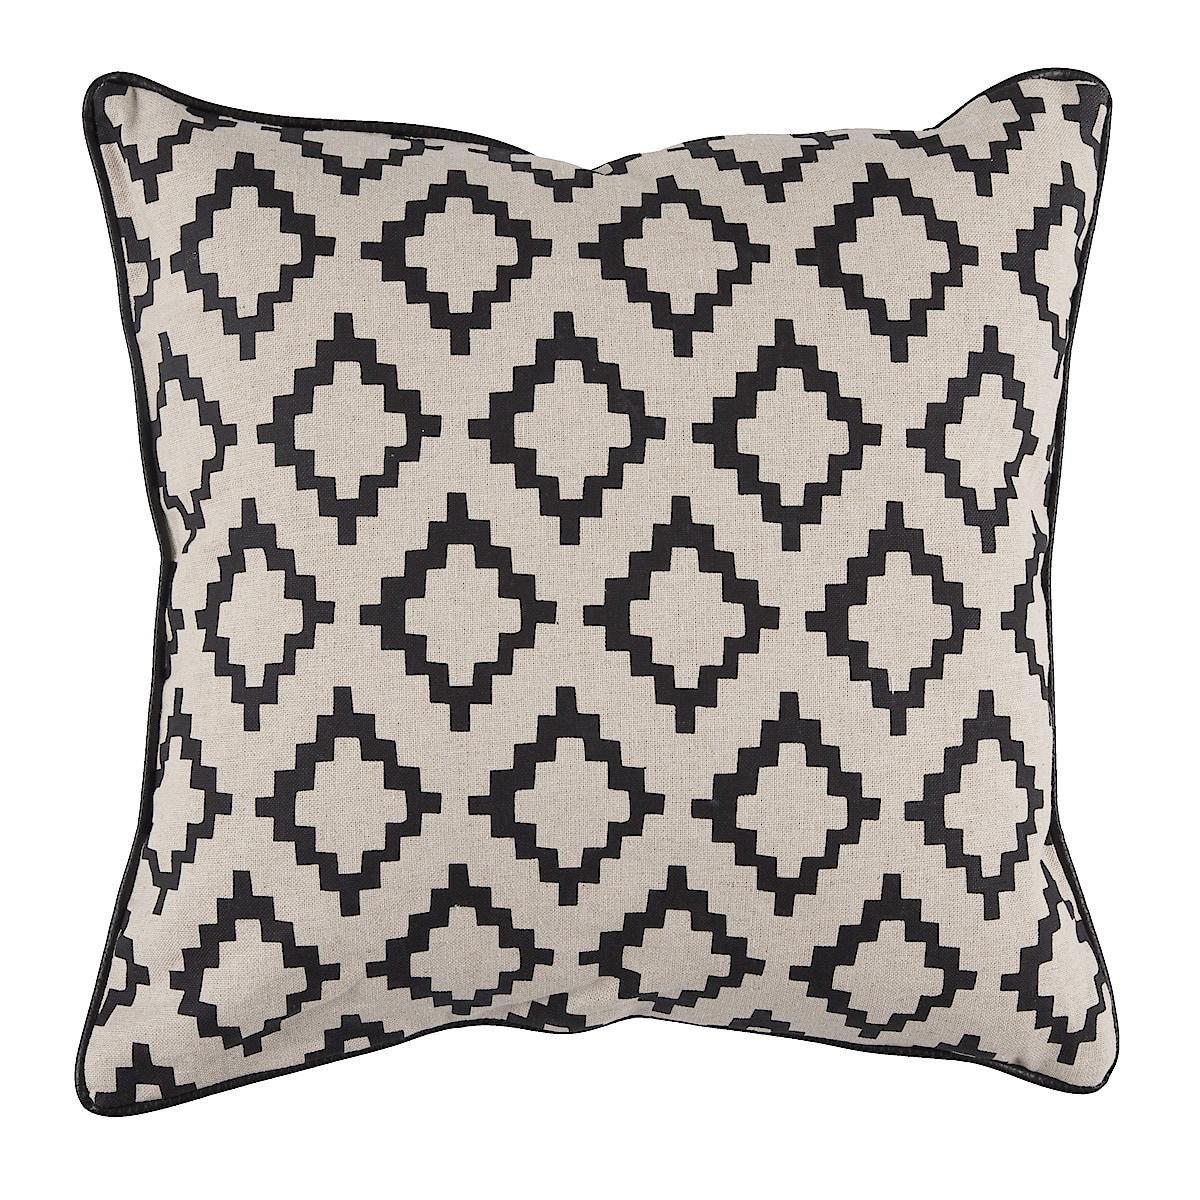 Inka Cushion Cover 45x45 cm